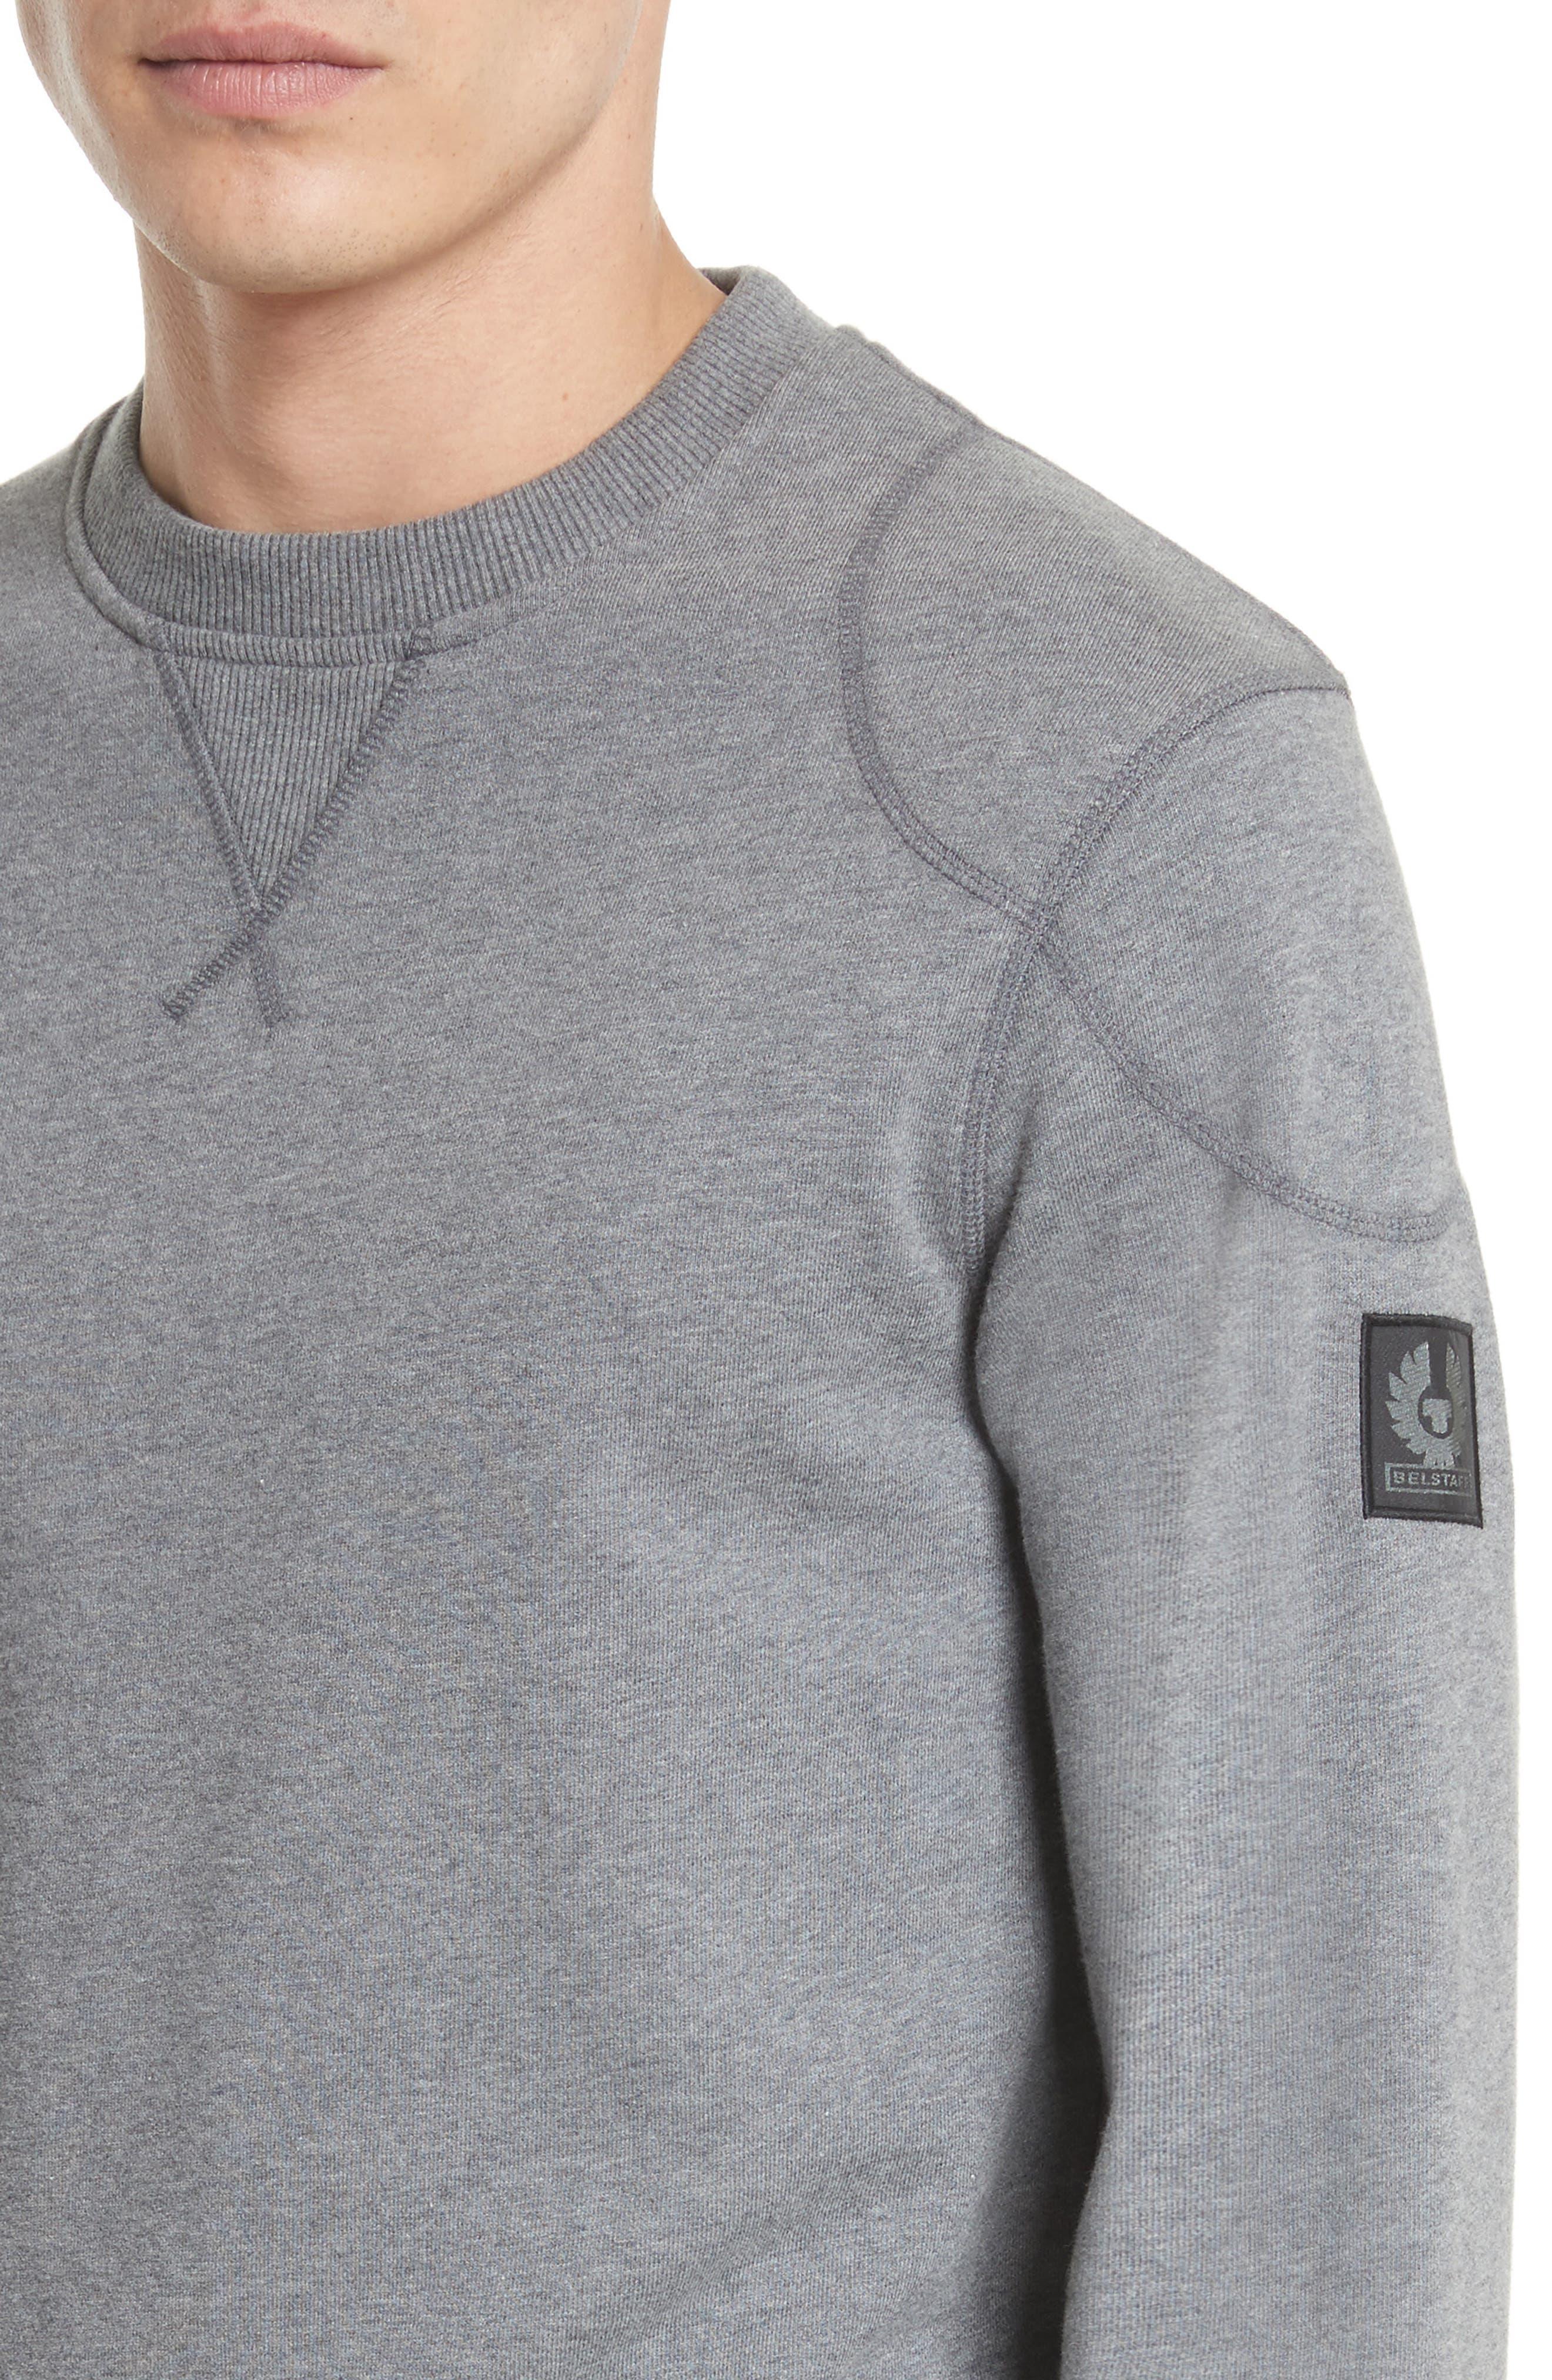 Jefferson Fleece Sweatshirt,                             Alternate thumbnail 4, color,                             020